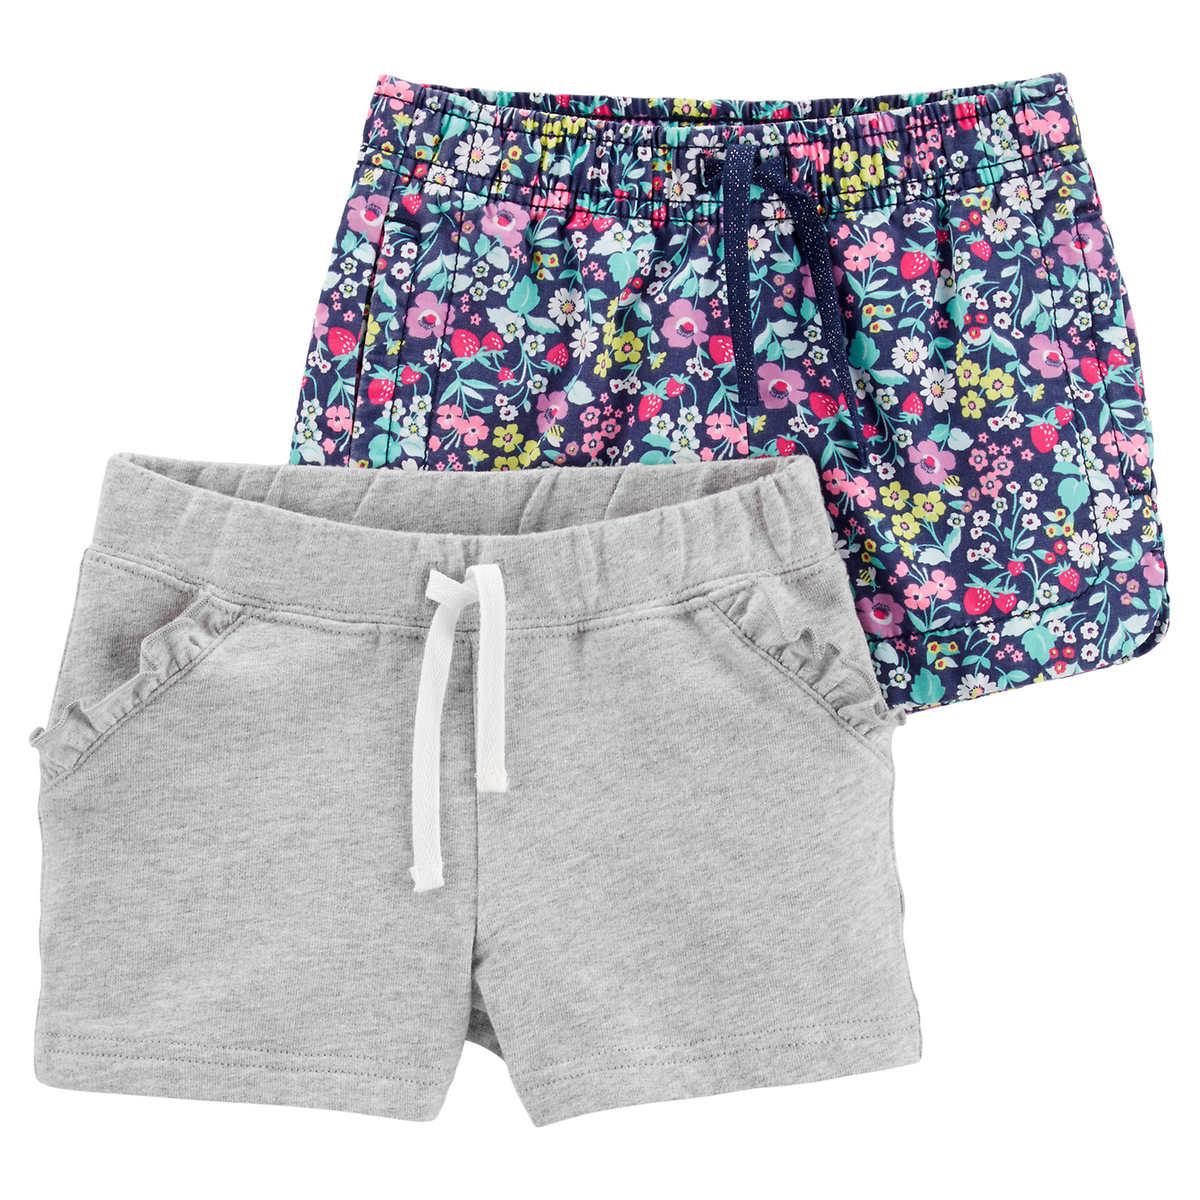 995857ce7 Carters Mix & Match, Kids Bottoms, Grey/Flowers, 2-pack